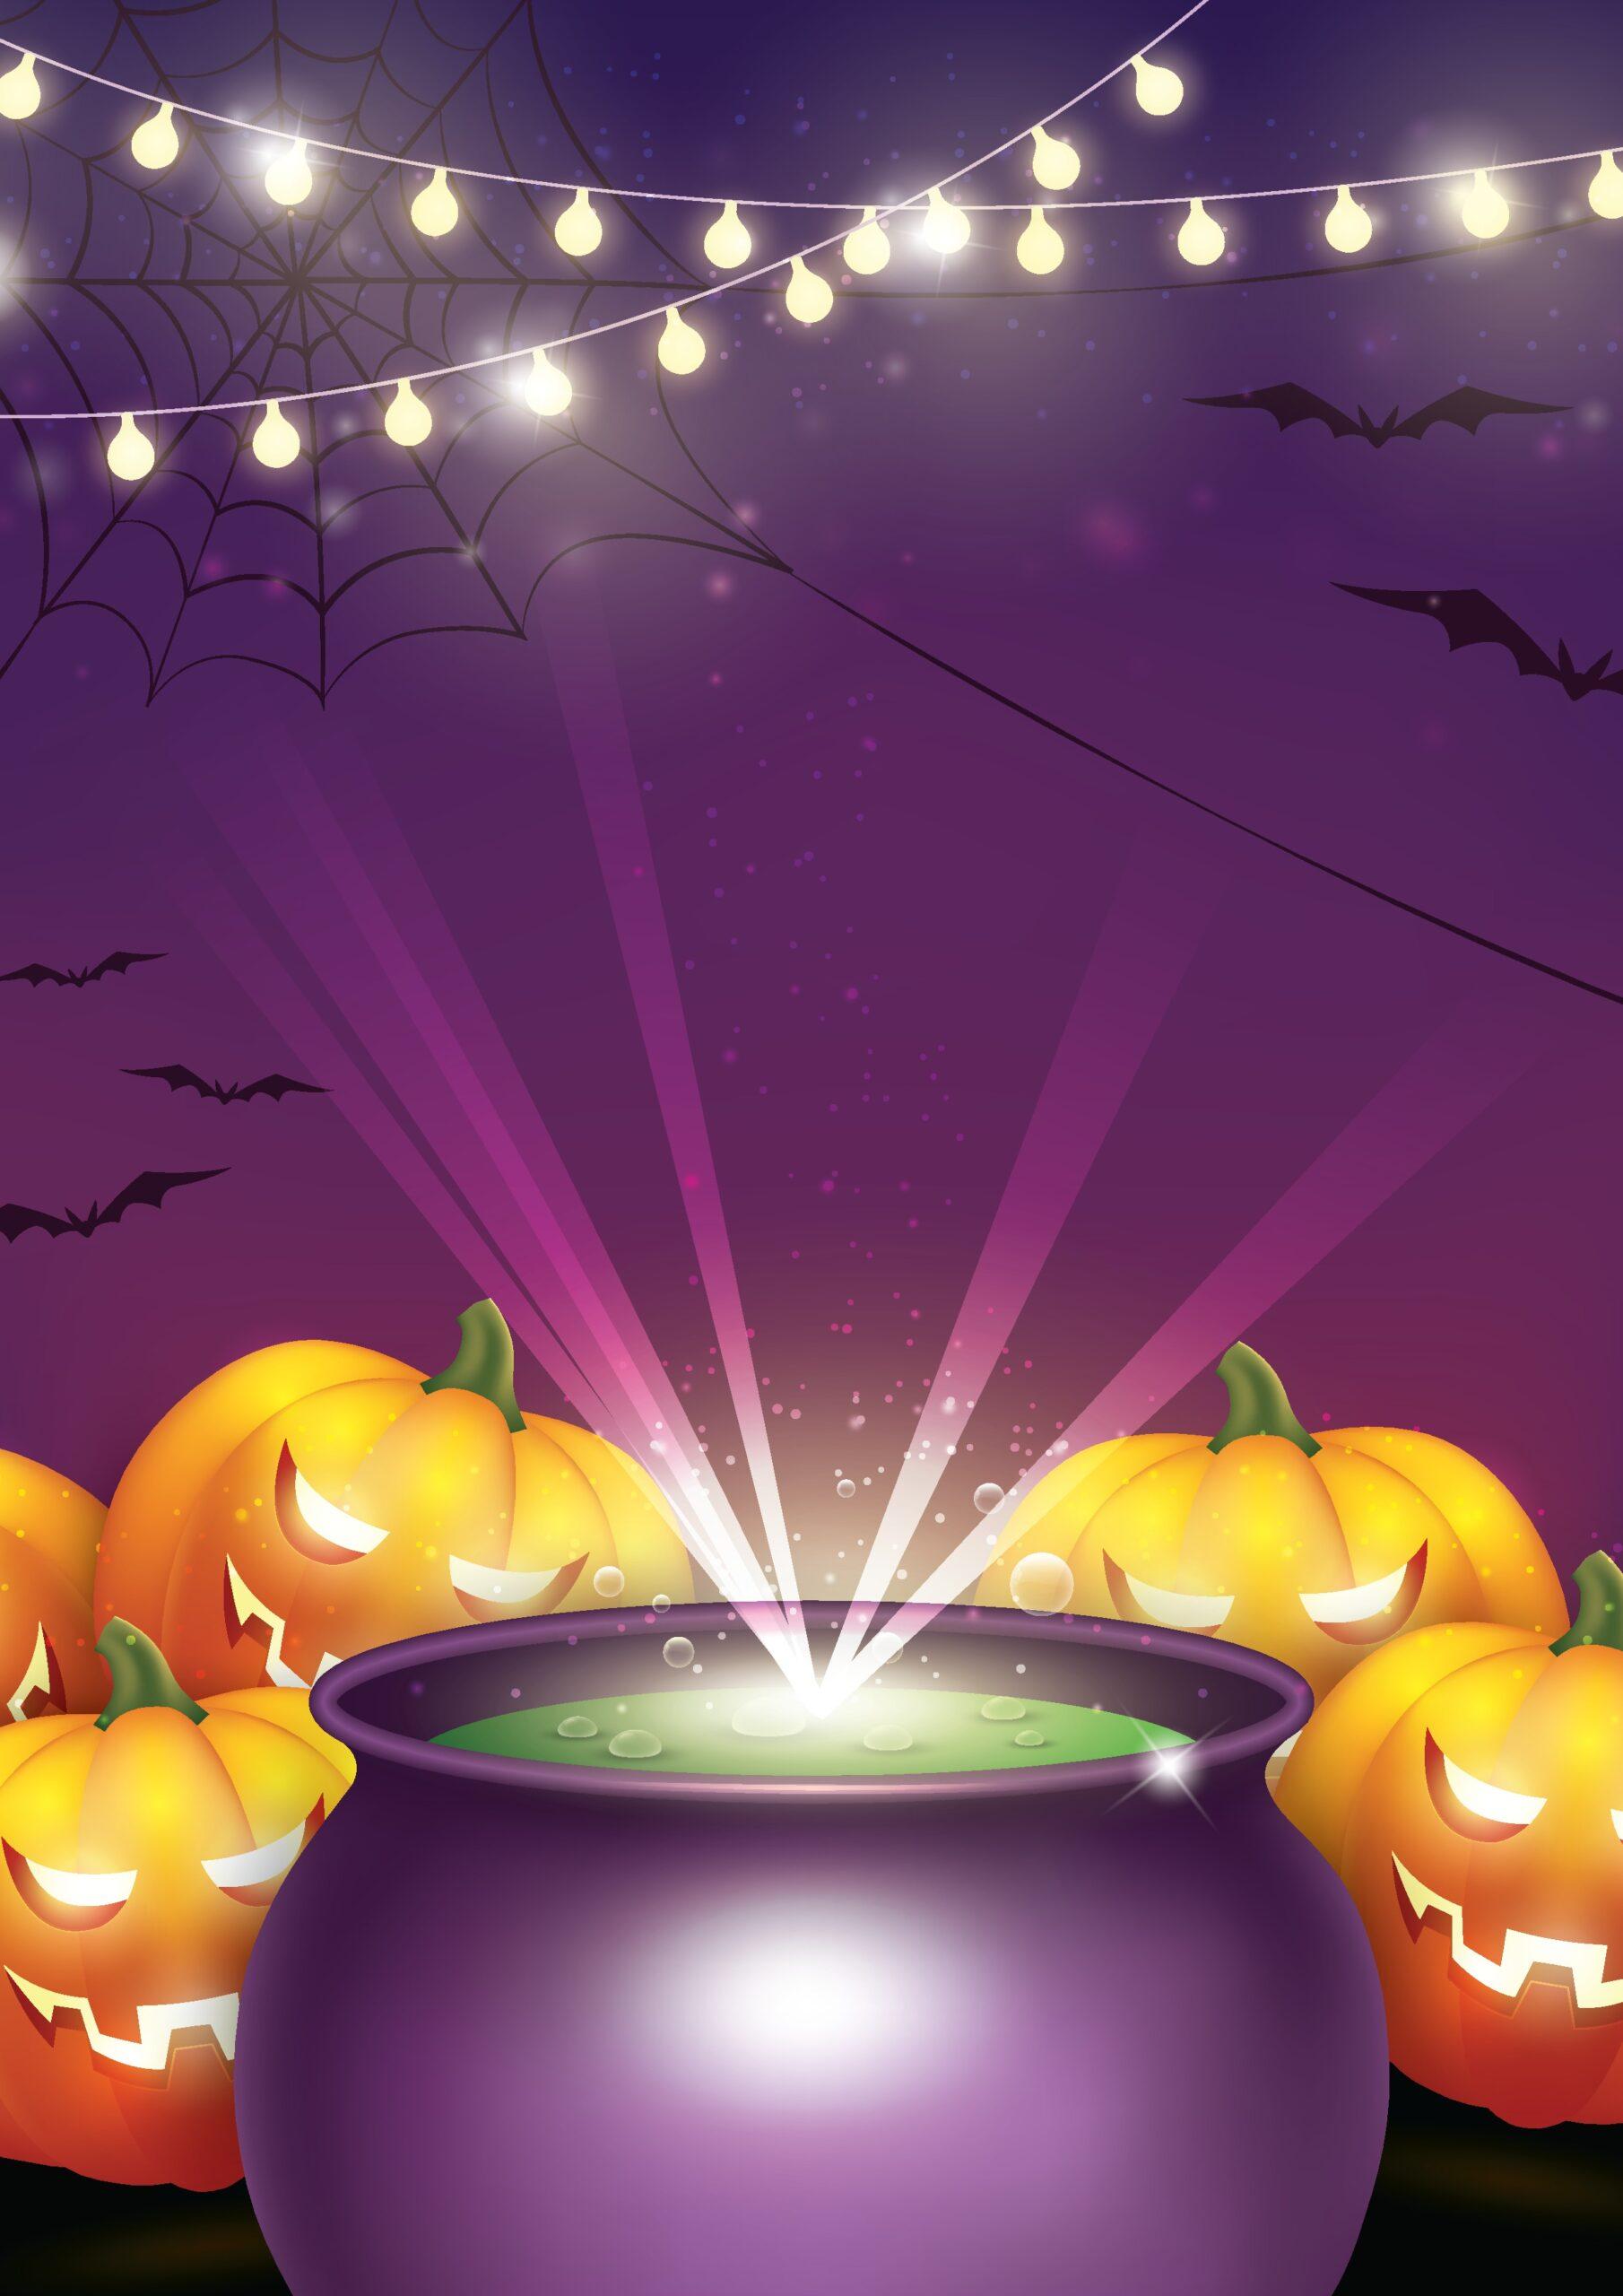 cauldron with jack-o-lanterns and string lights